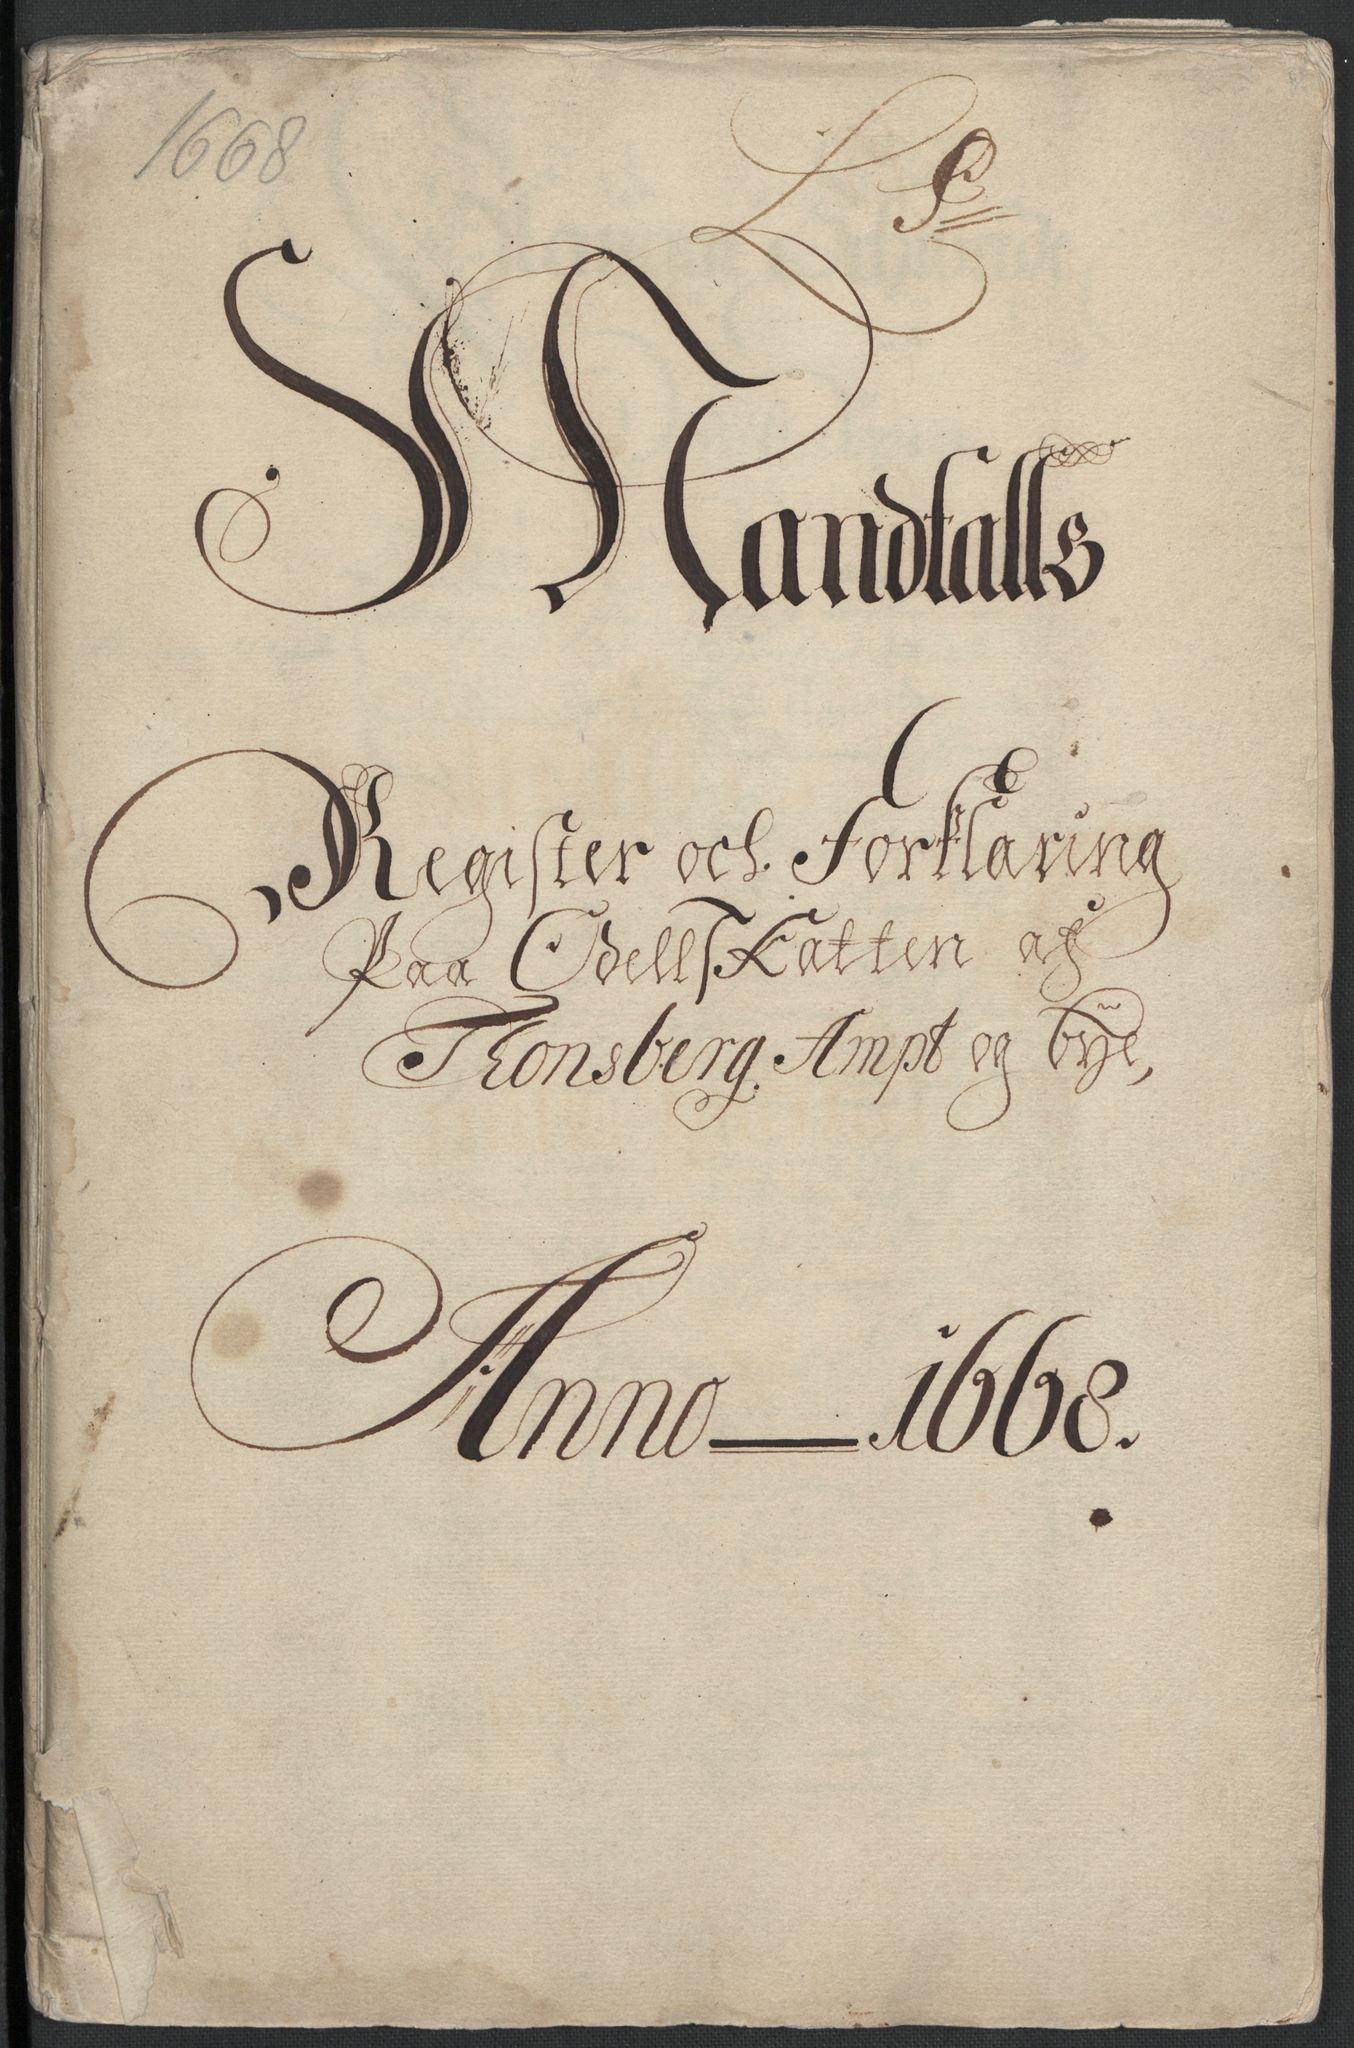 RA, Rentekammeret inntil 1814, Reviderte regnskaper, Fogderegnskap, R32/L1840: Fogderegnskap Jarlsberg grevskap, 1664-1673, s. 121